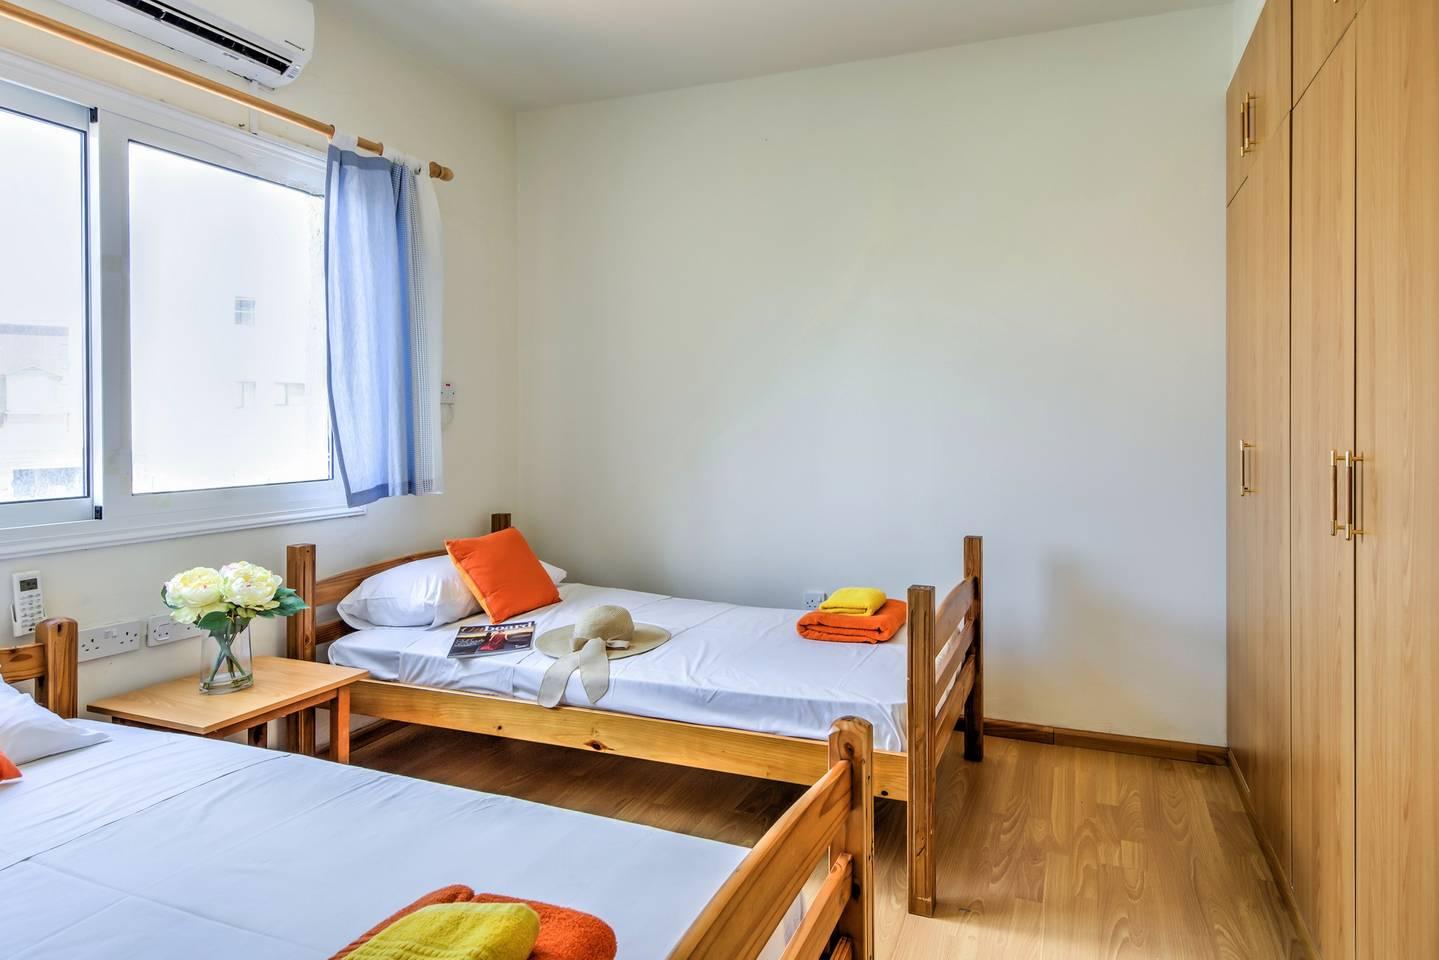 Apartment Large 2 Bedroom Apt - Ayia Napa Centre - ANDREA photo 25600637